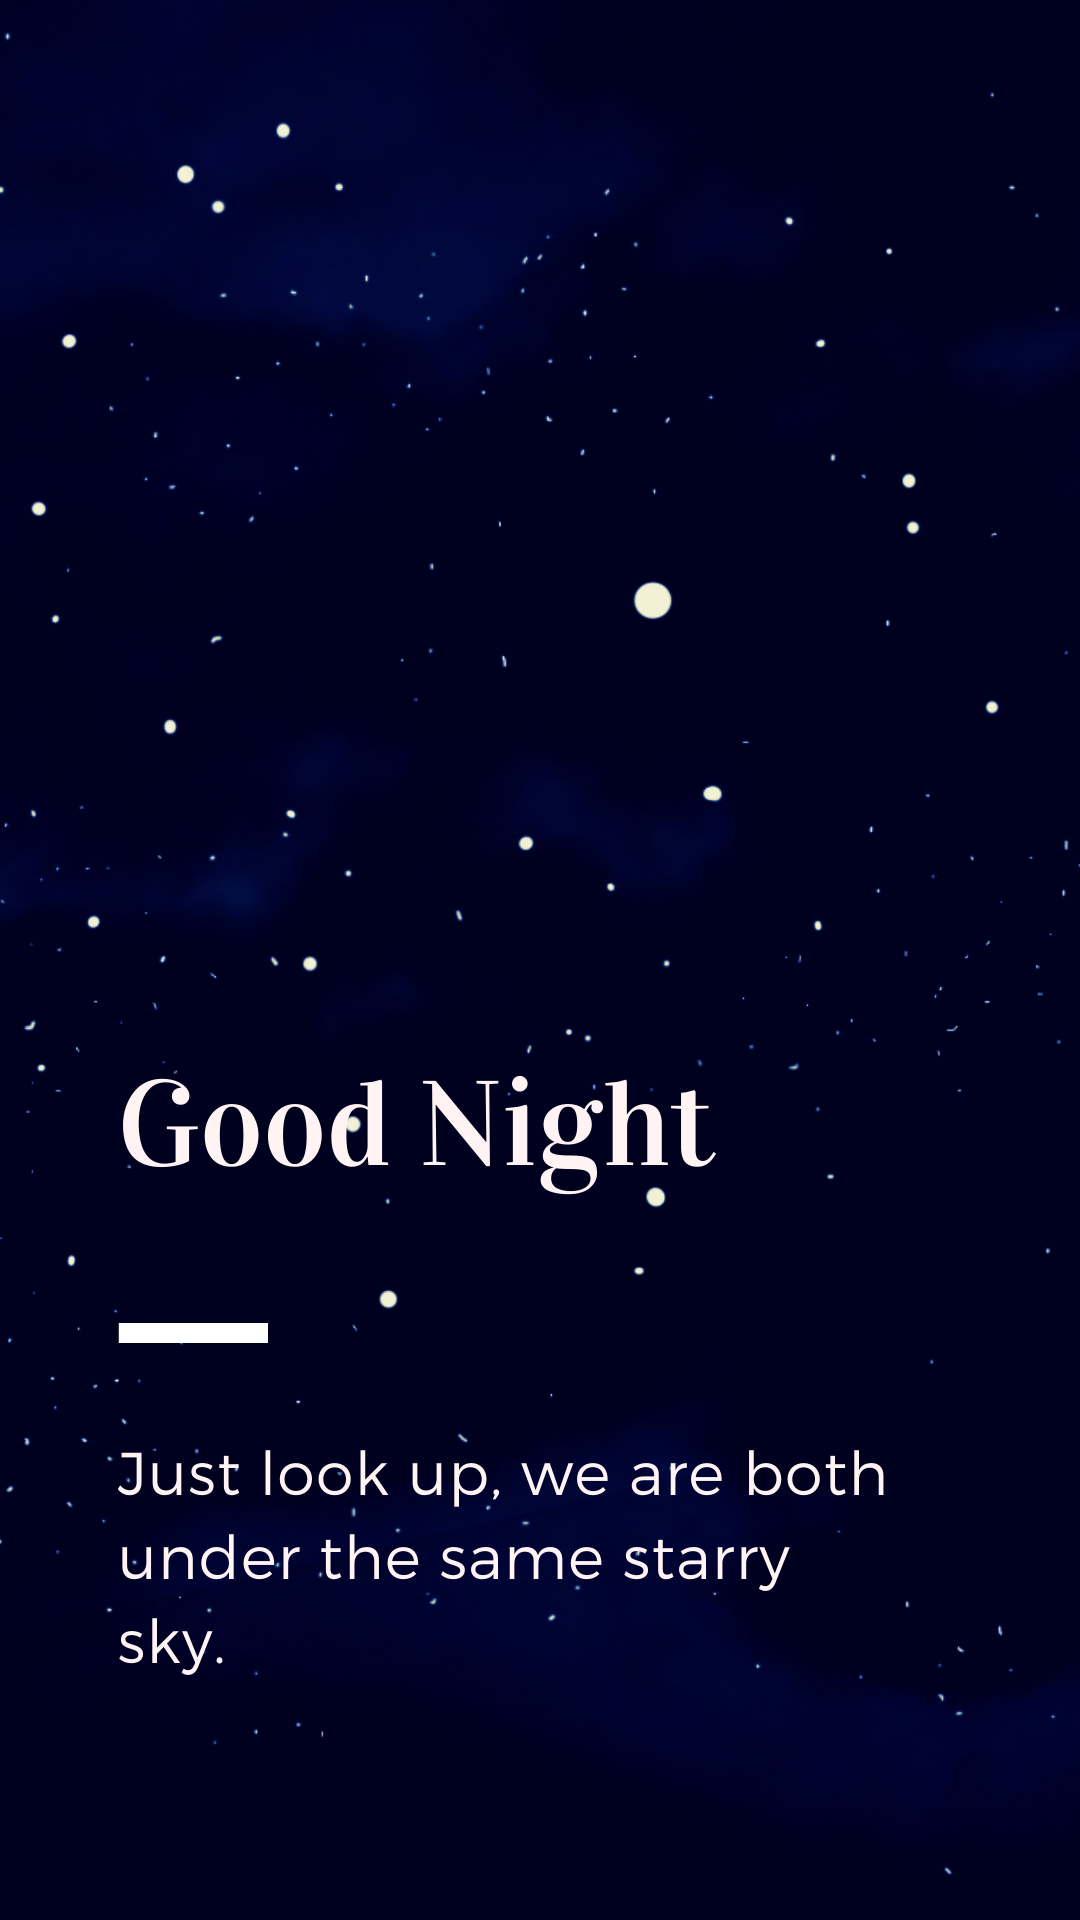 Good nighBest Beautiful Good Night English status, Good Night wishes massage, Good Night Images Picture, Photo, Quotes,